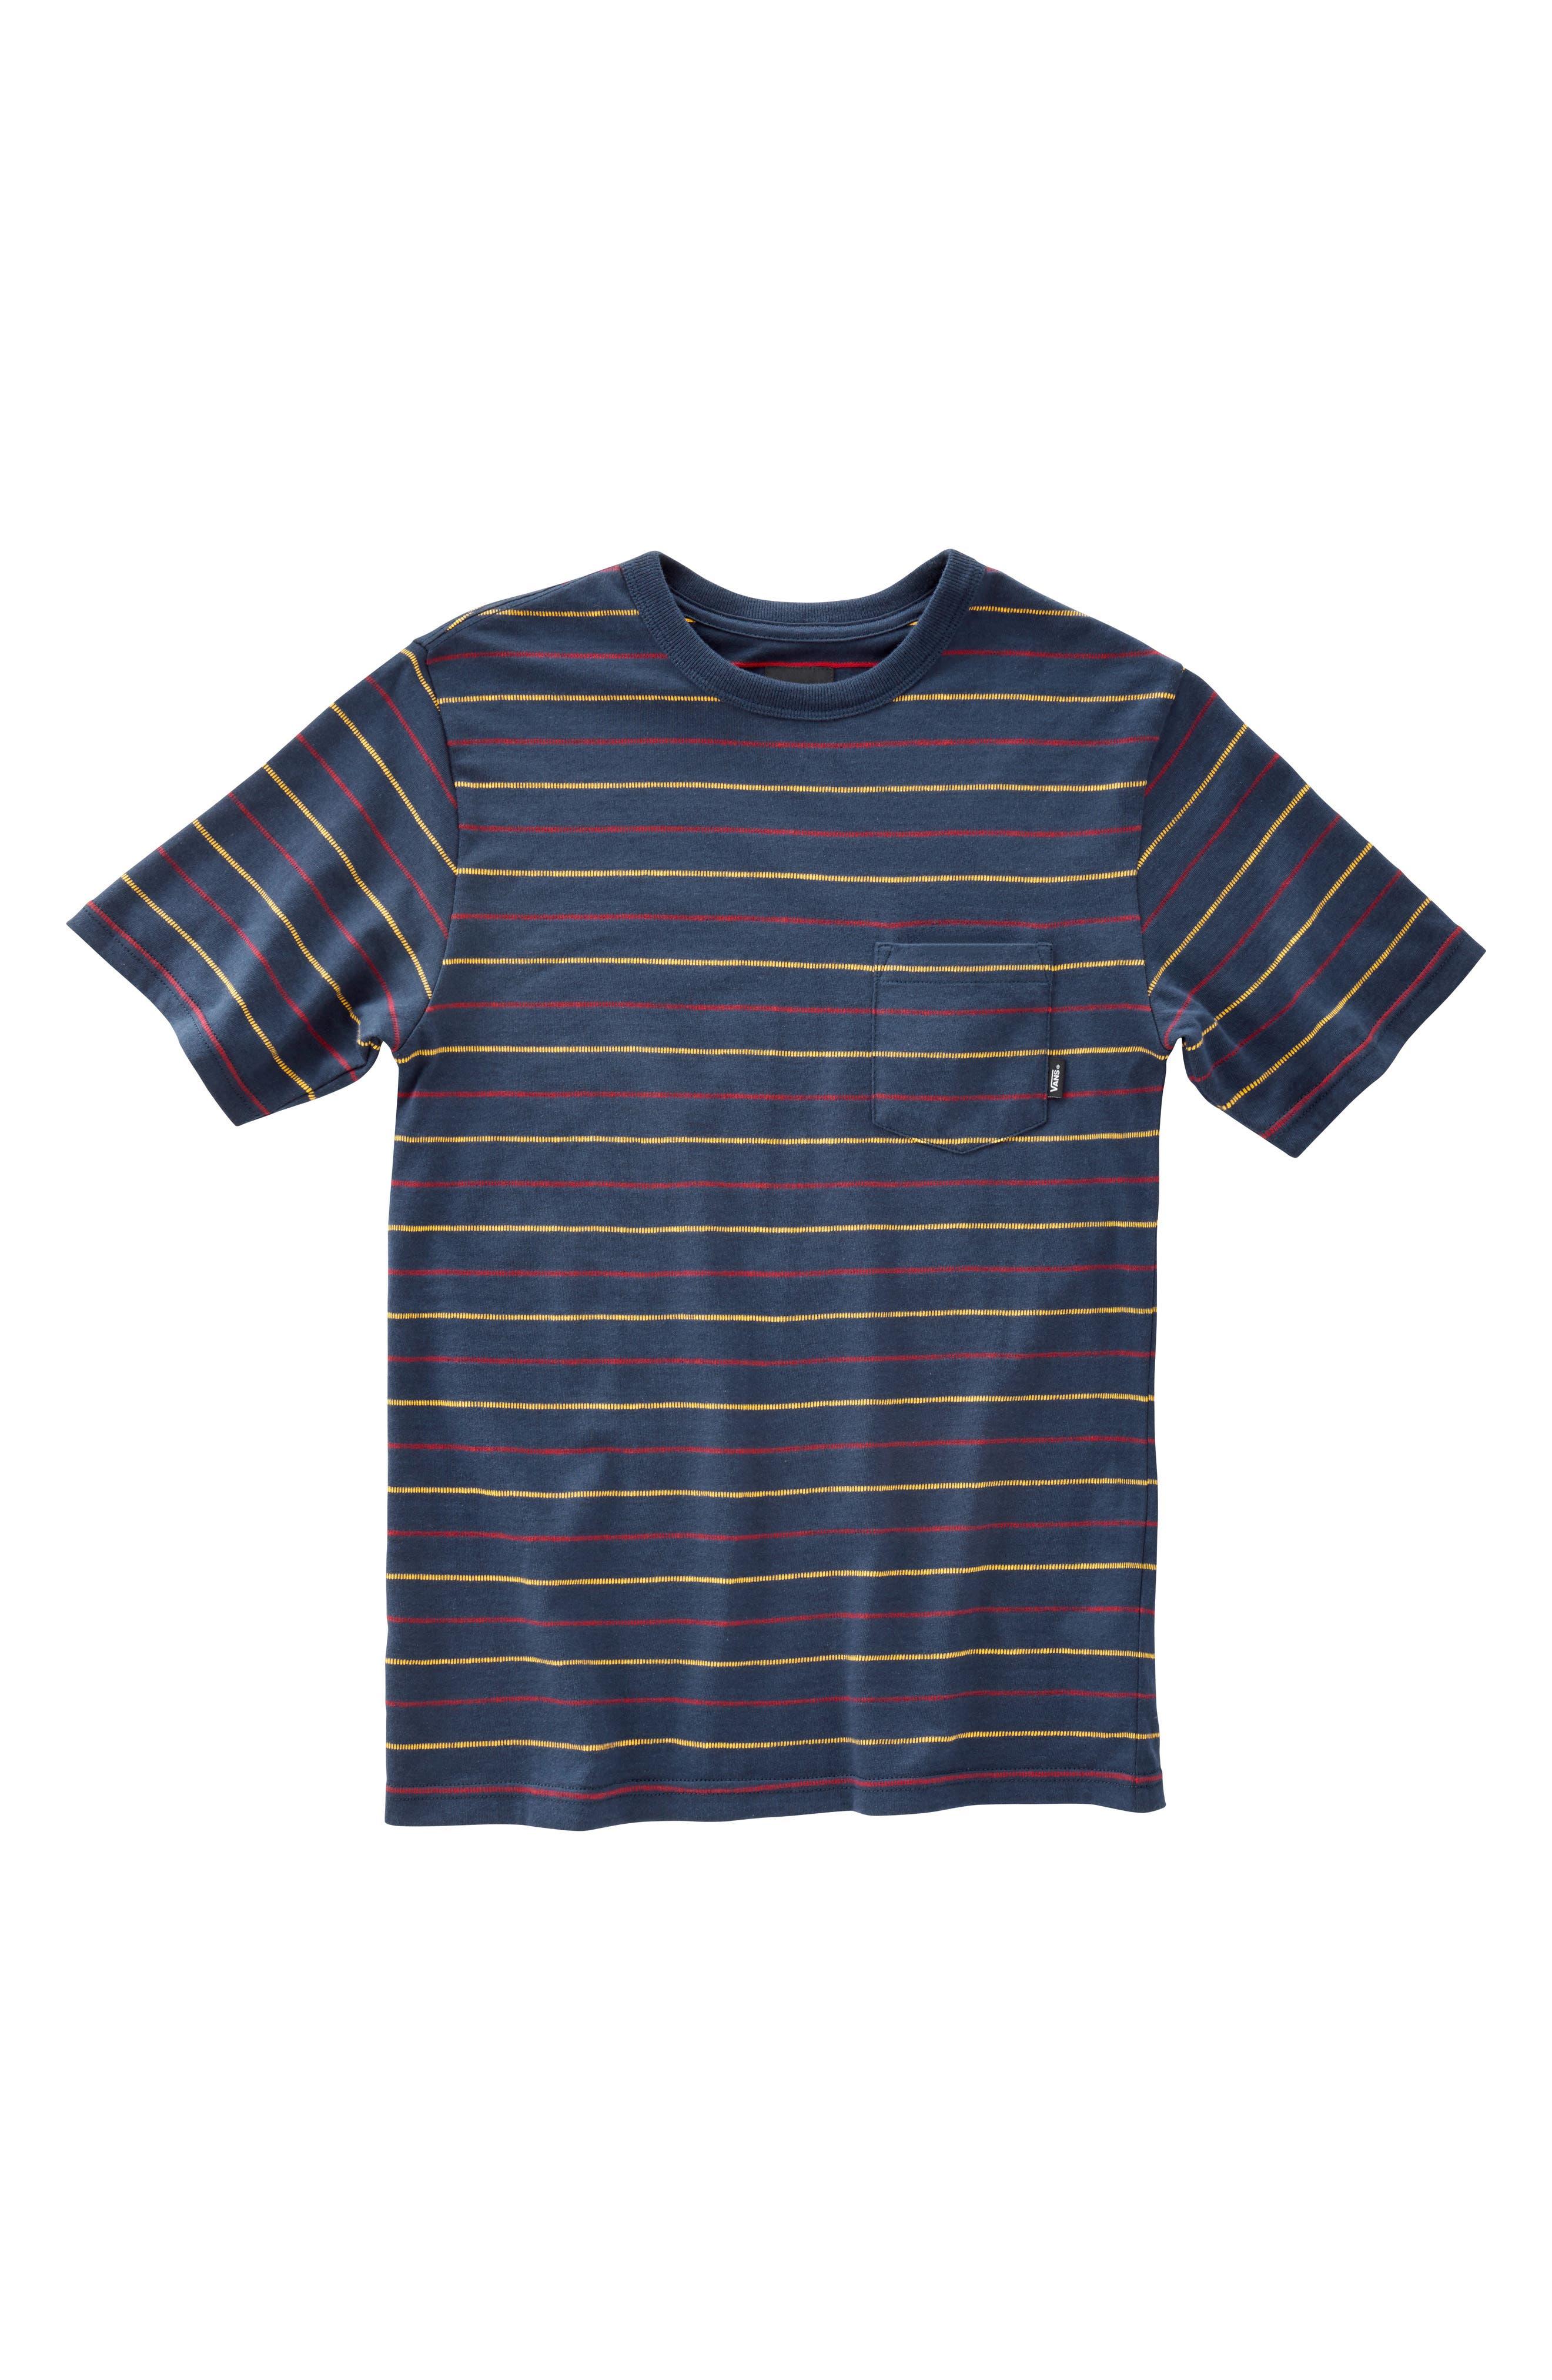 Strikemont III T-Shirt,                             Main thumbnail 1, color,                             DRESS BLUES